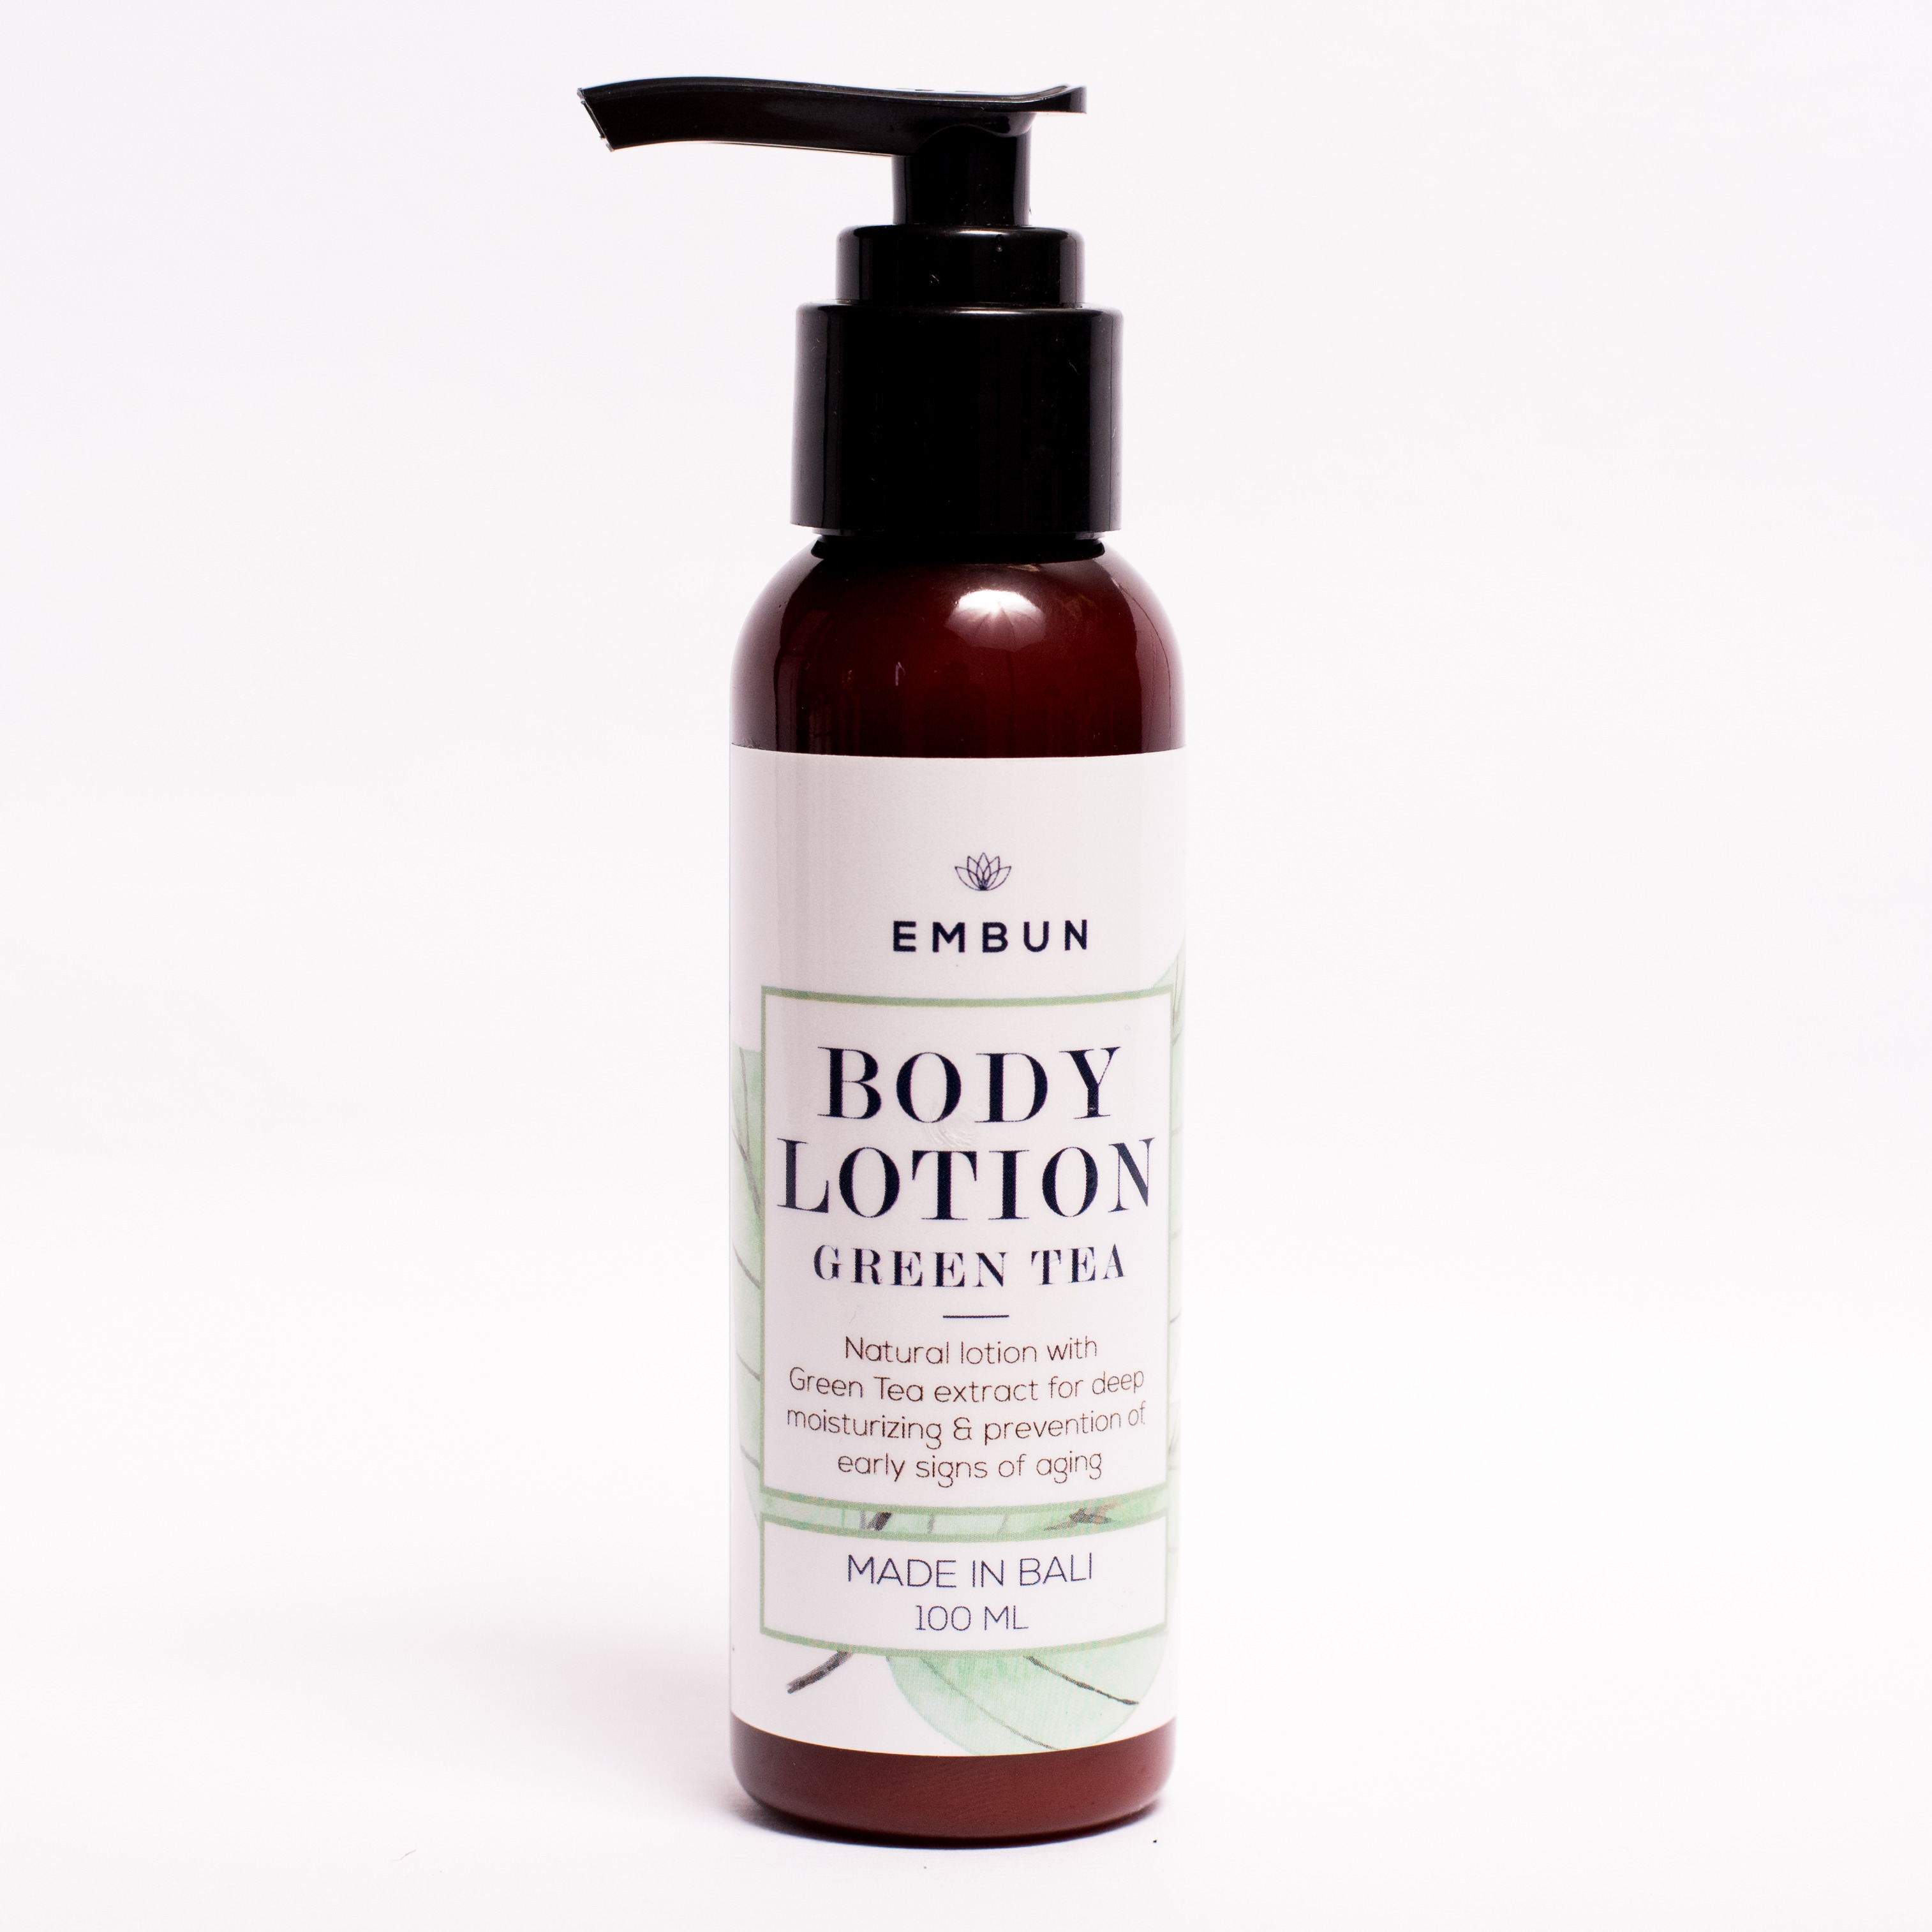 Embun Body Lotion Anti Aging Green Tea